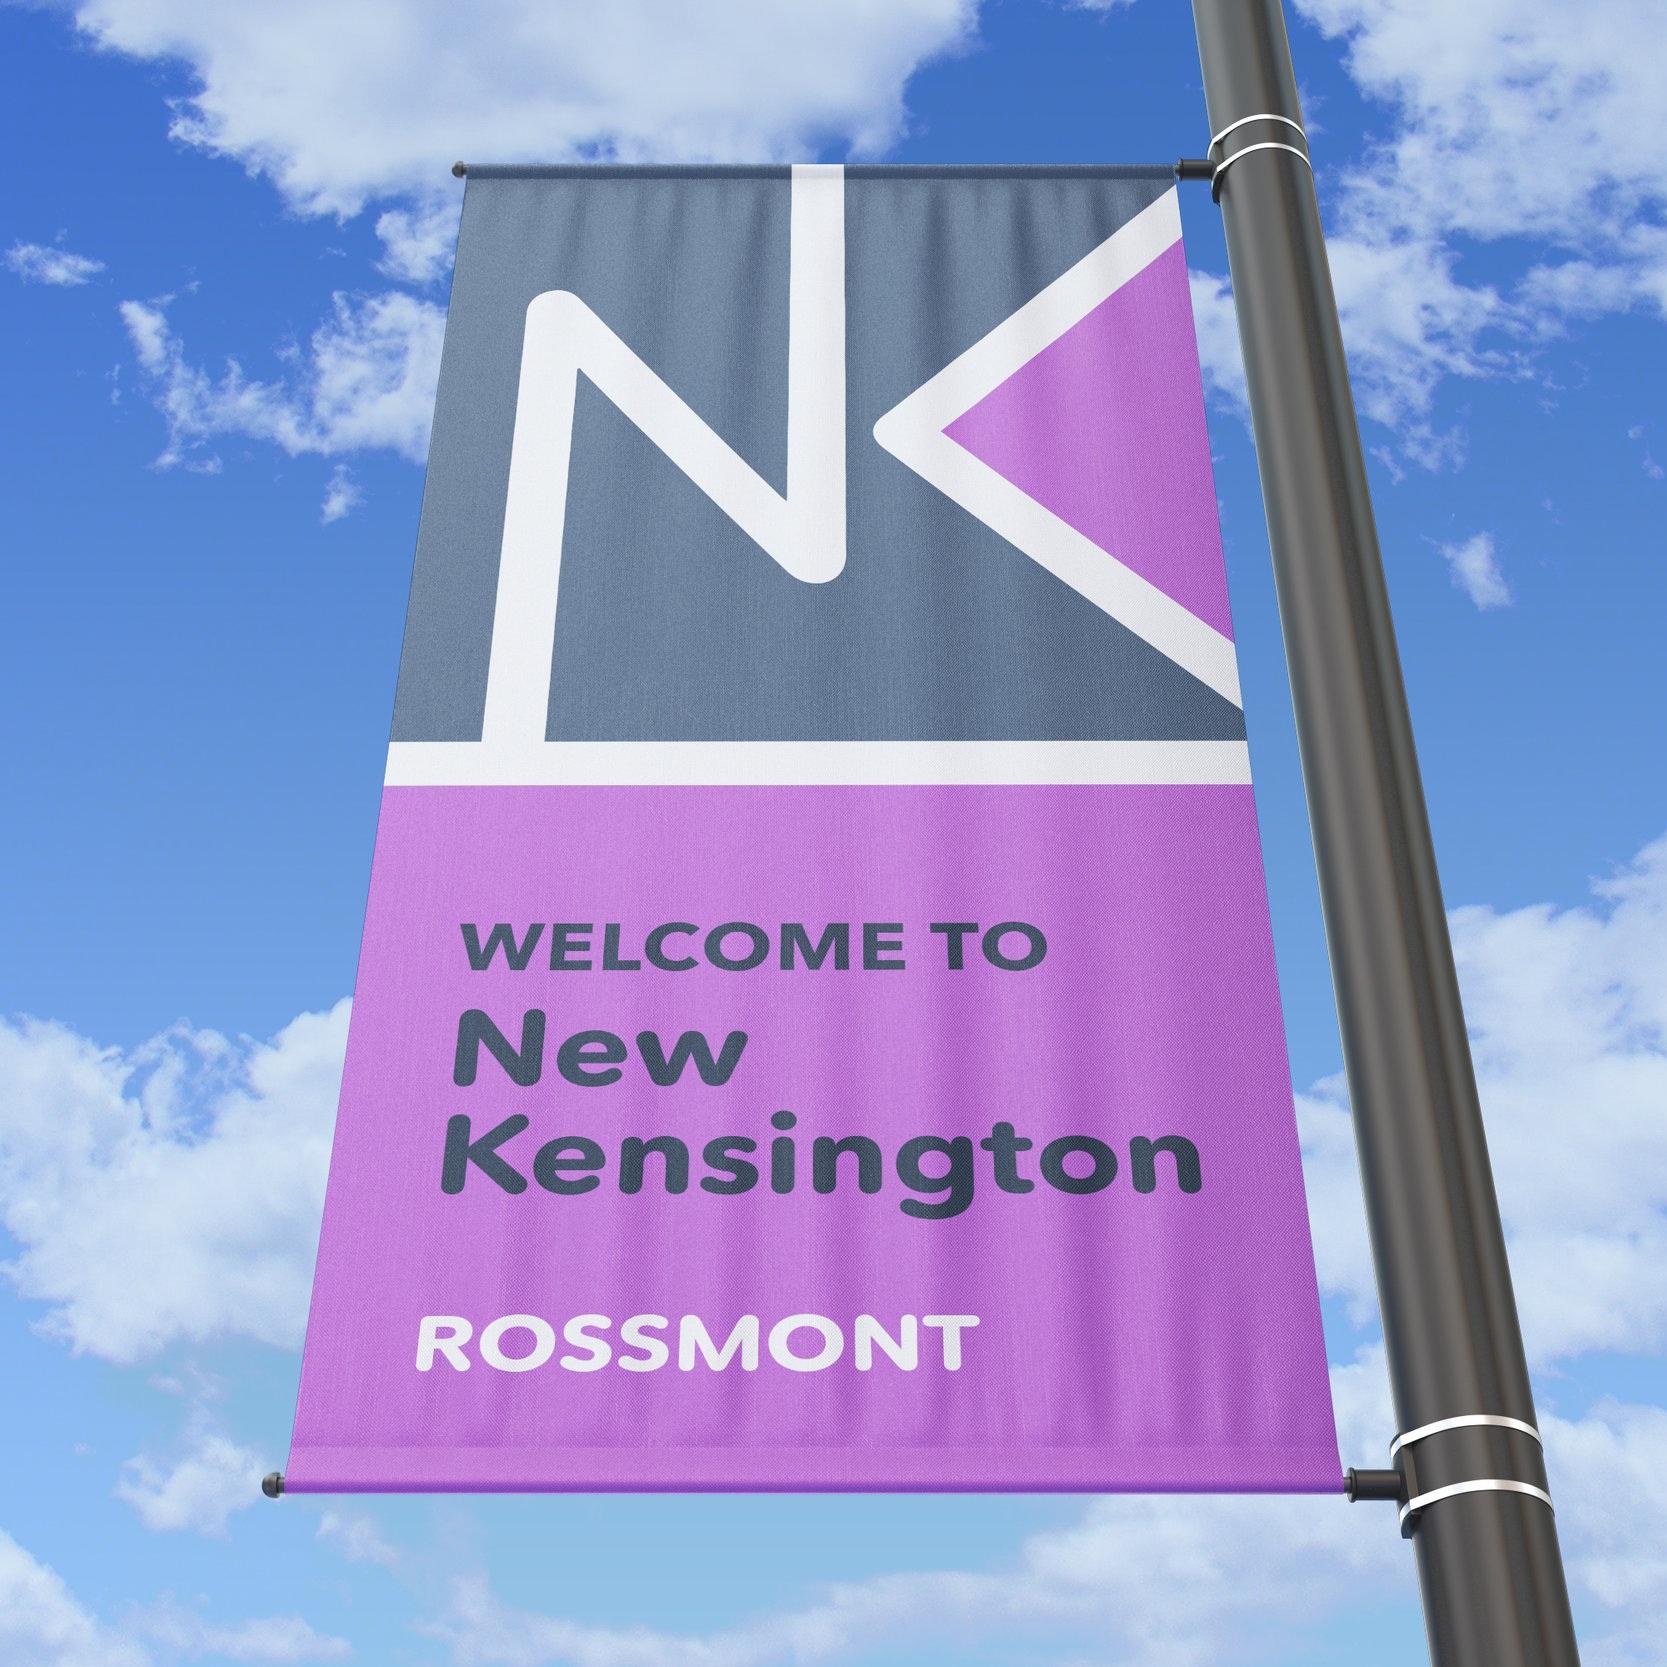 NewKen_Welcome_Poster_Concept2_Rossmont.jpg